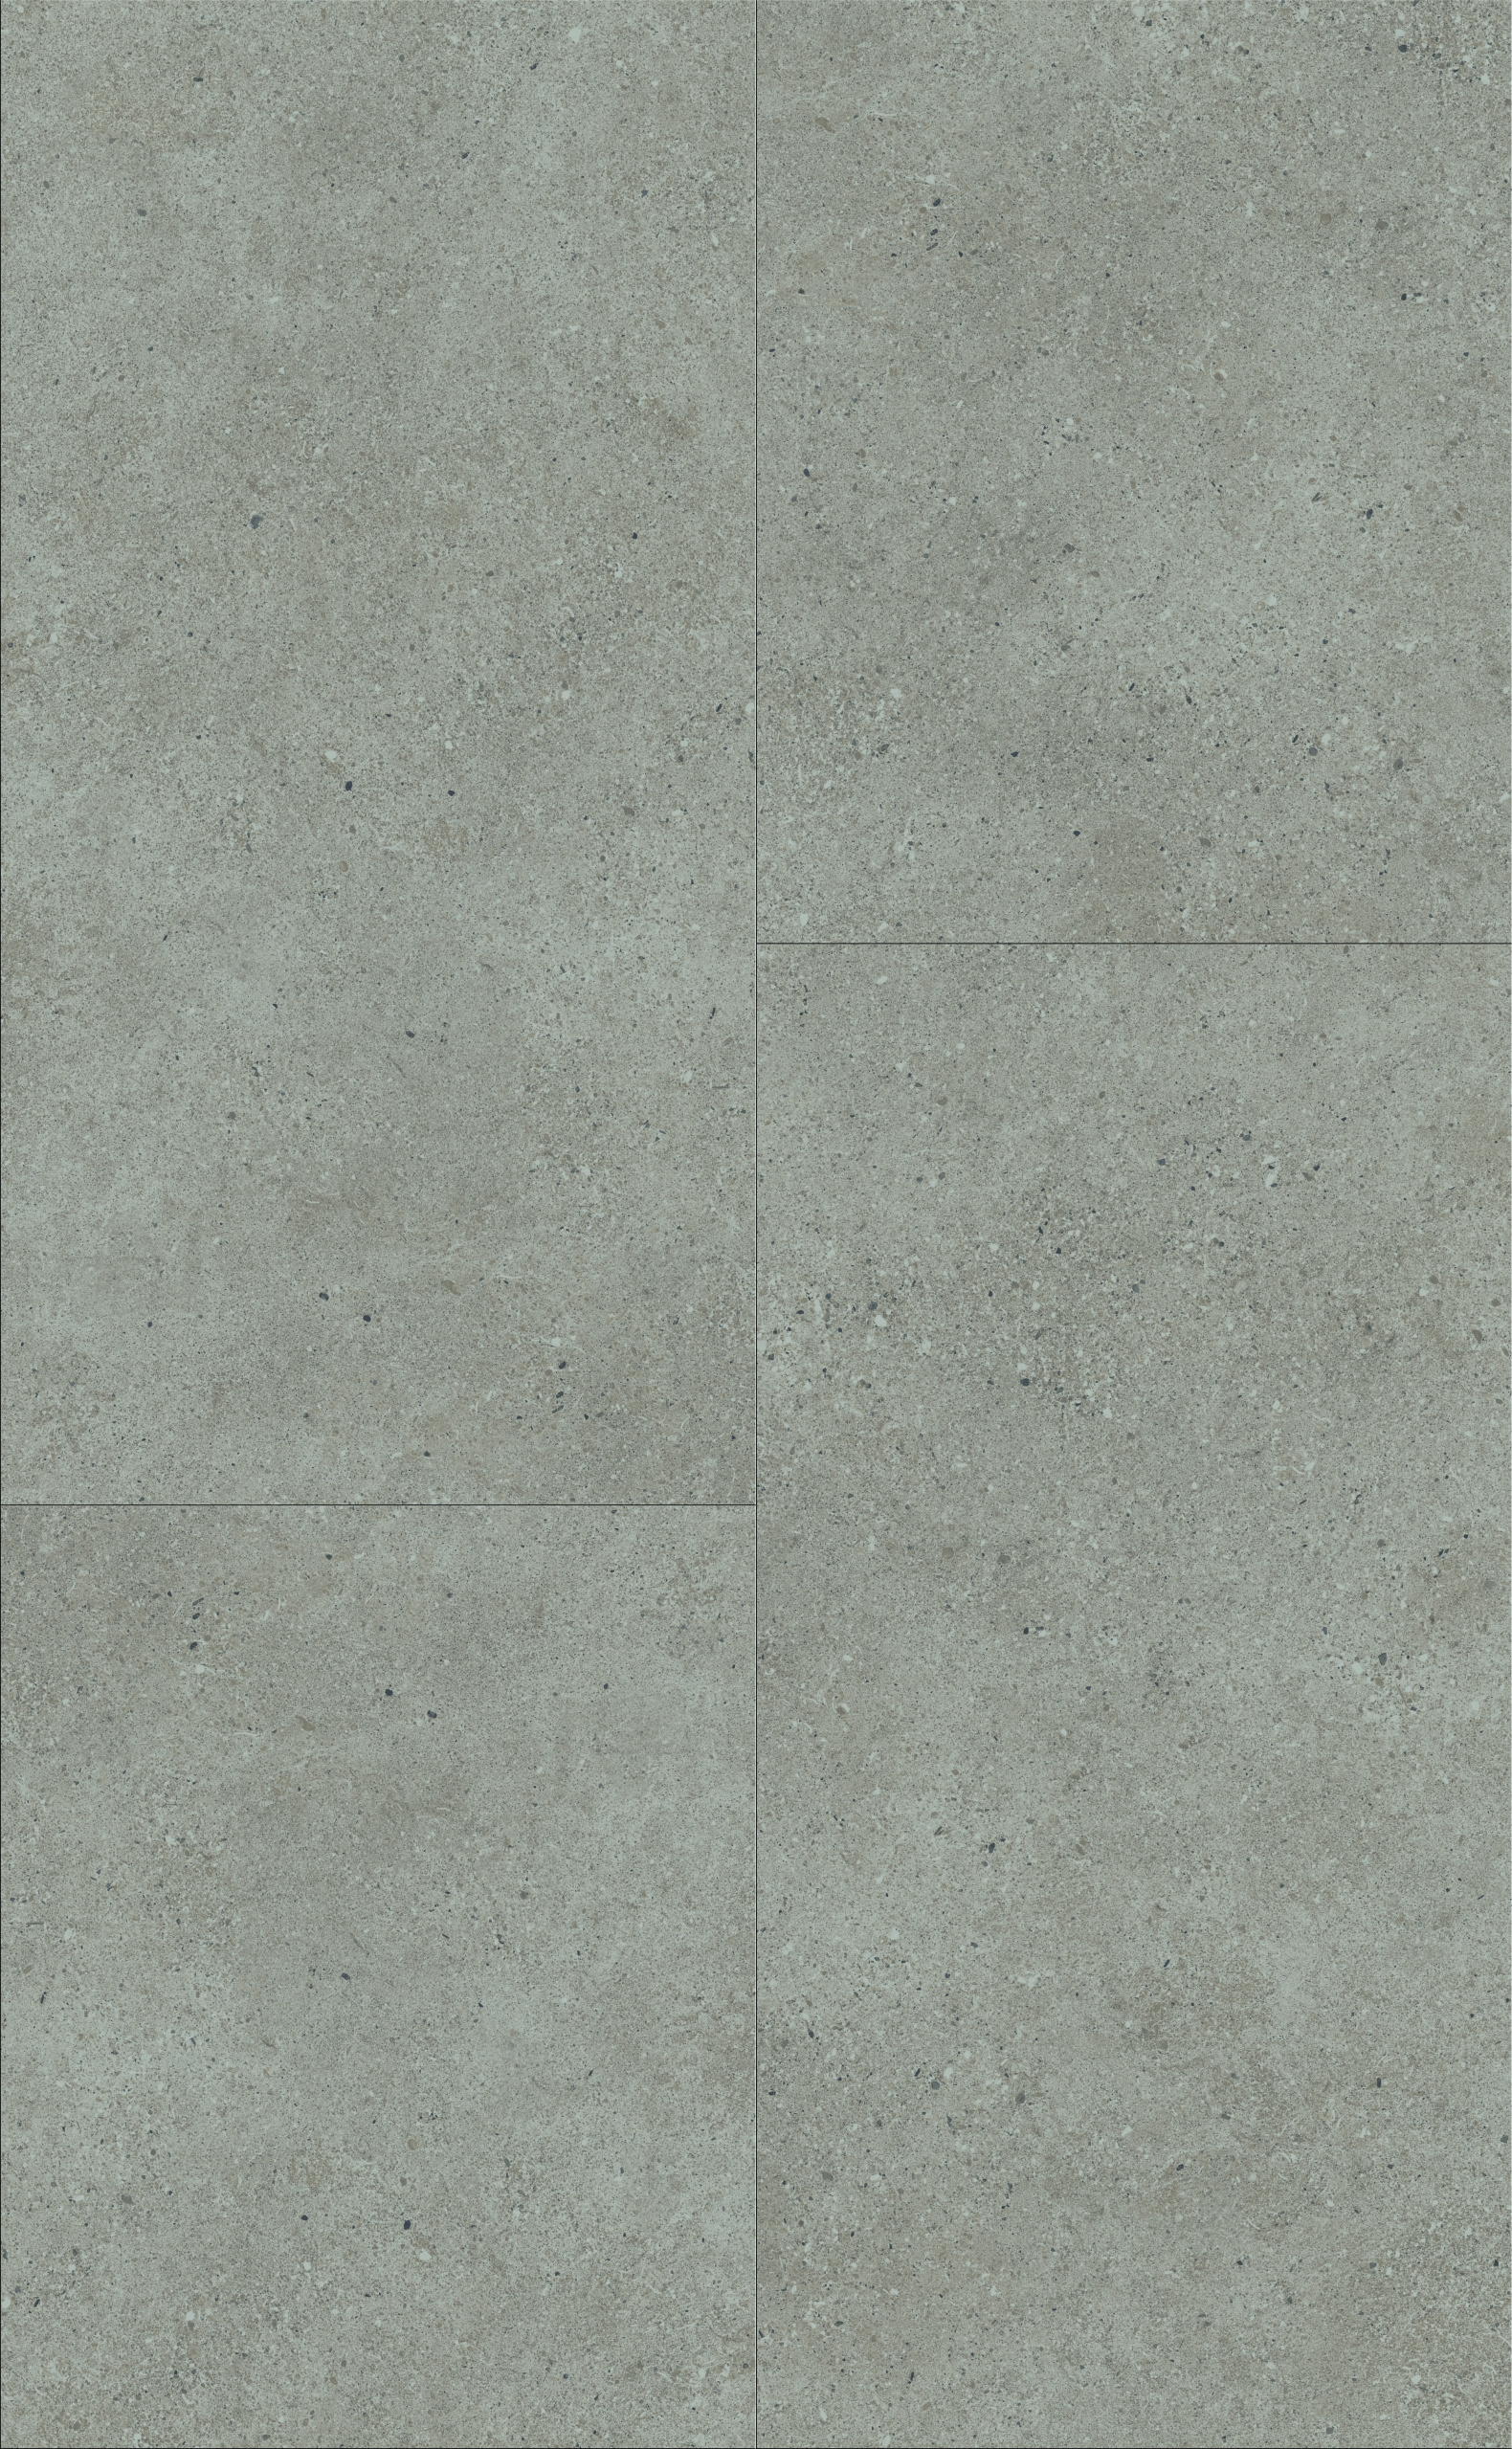 Vinylové podlahy Moduleo Select, Venetian Stone 46949